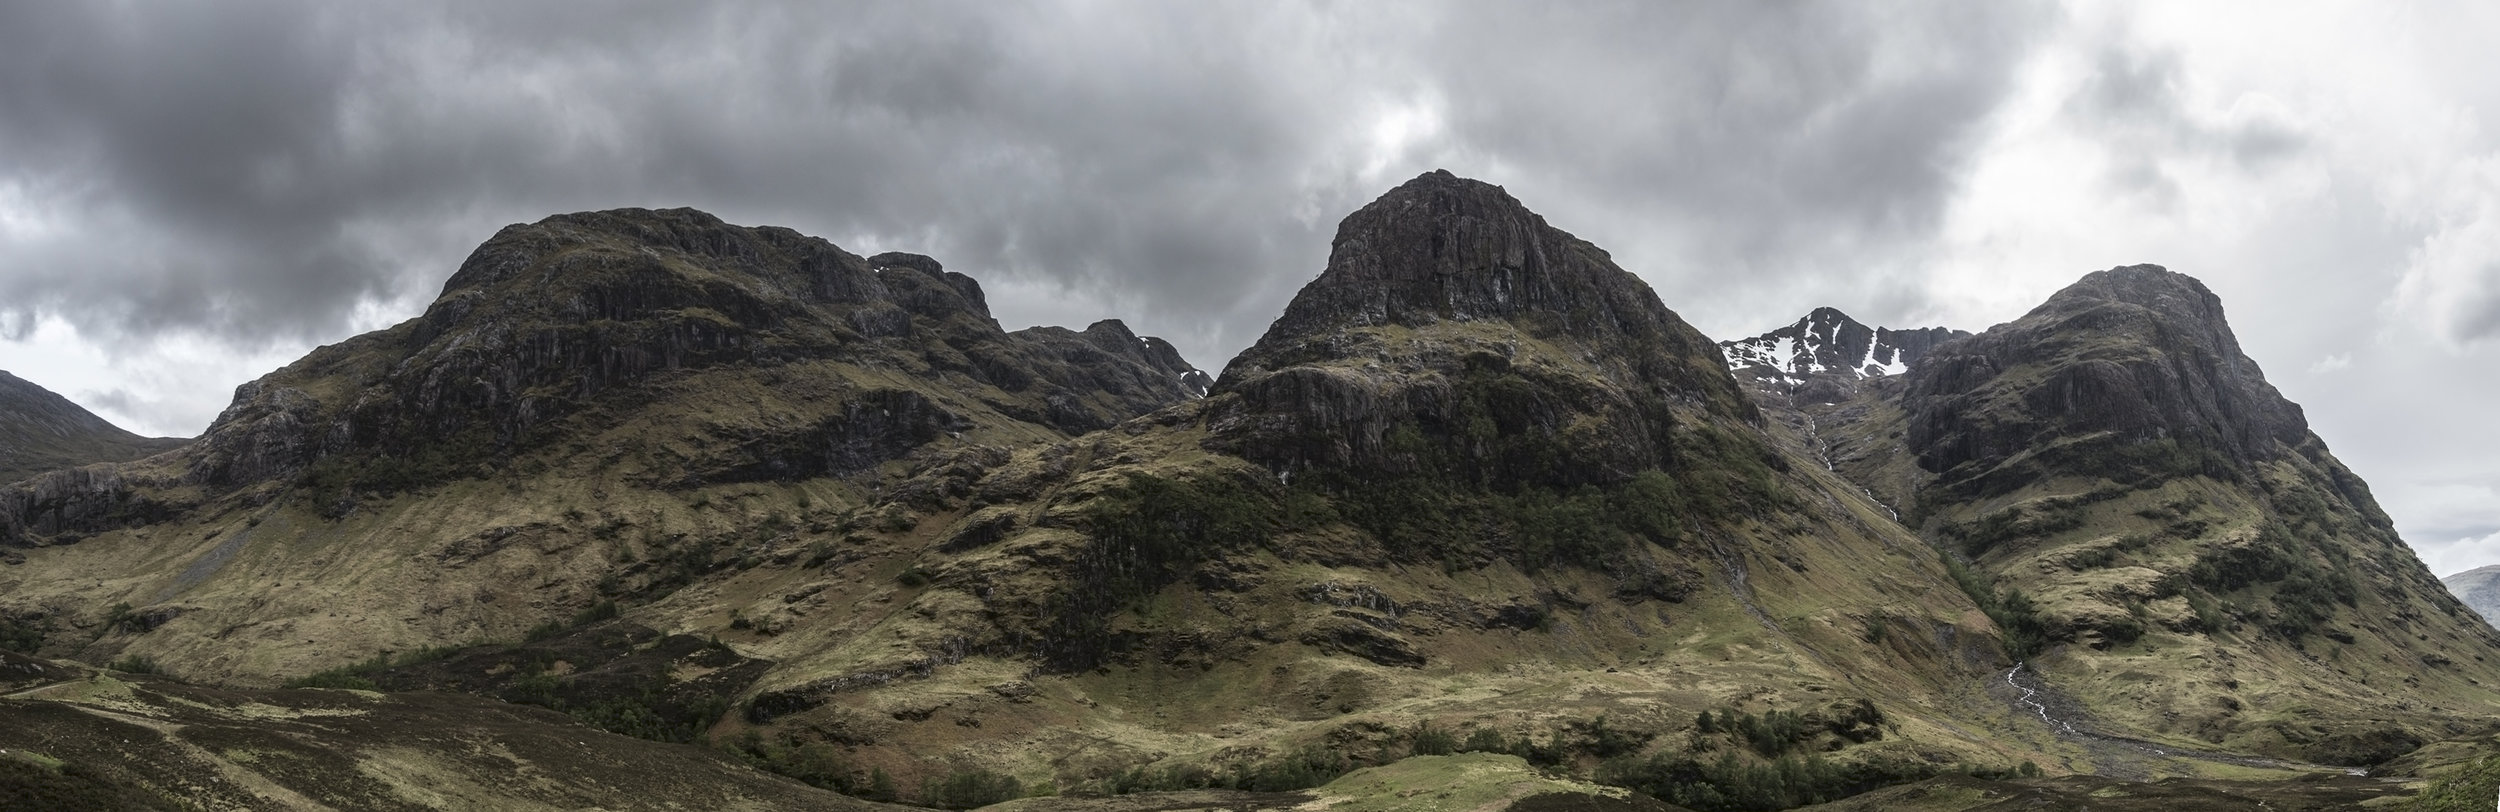 Scotland Pano 34.jpg